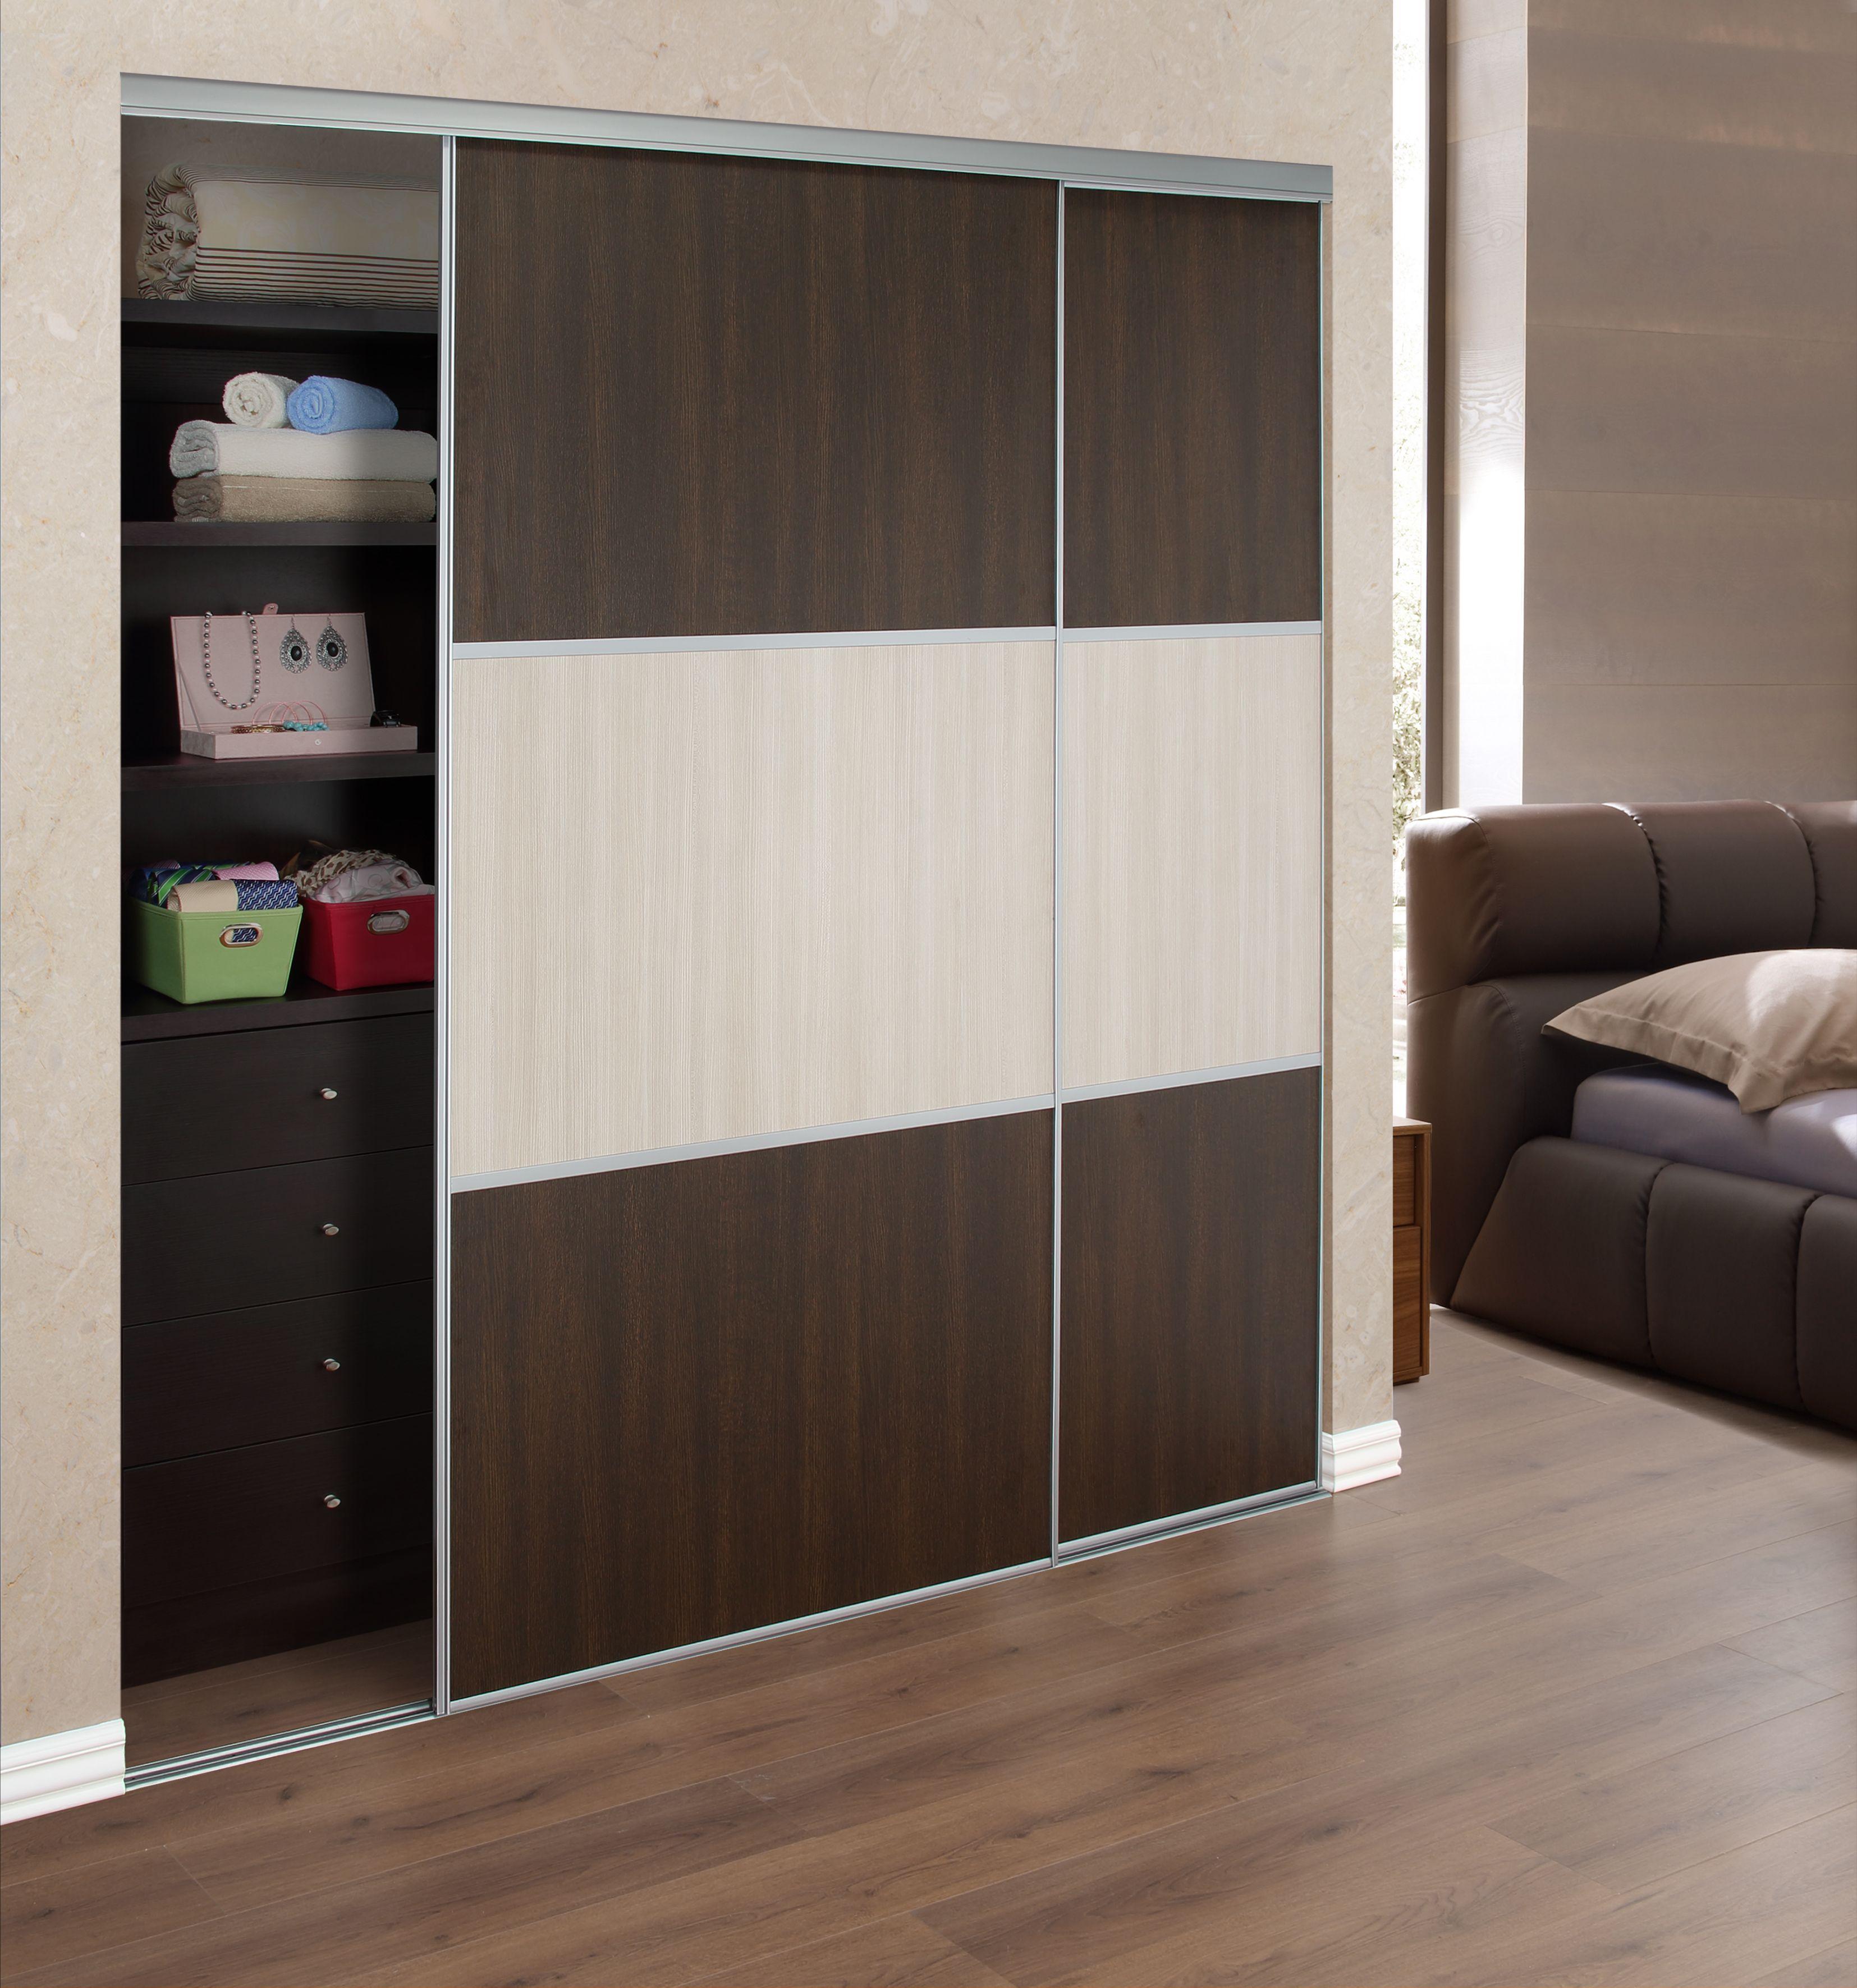 M s de 25 ideas incre bles sobre puertas closet en for Ideas para puertas de closet